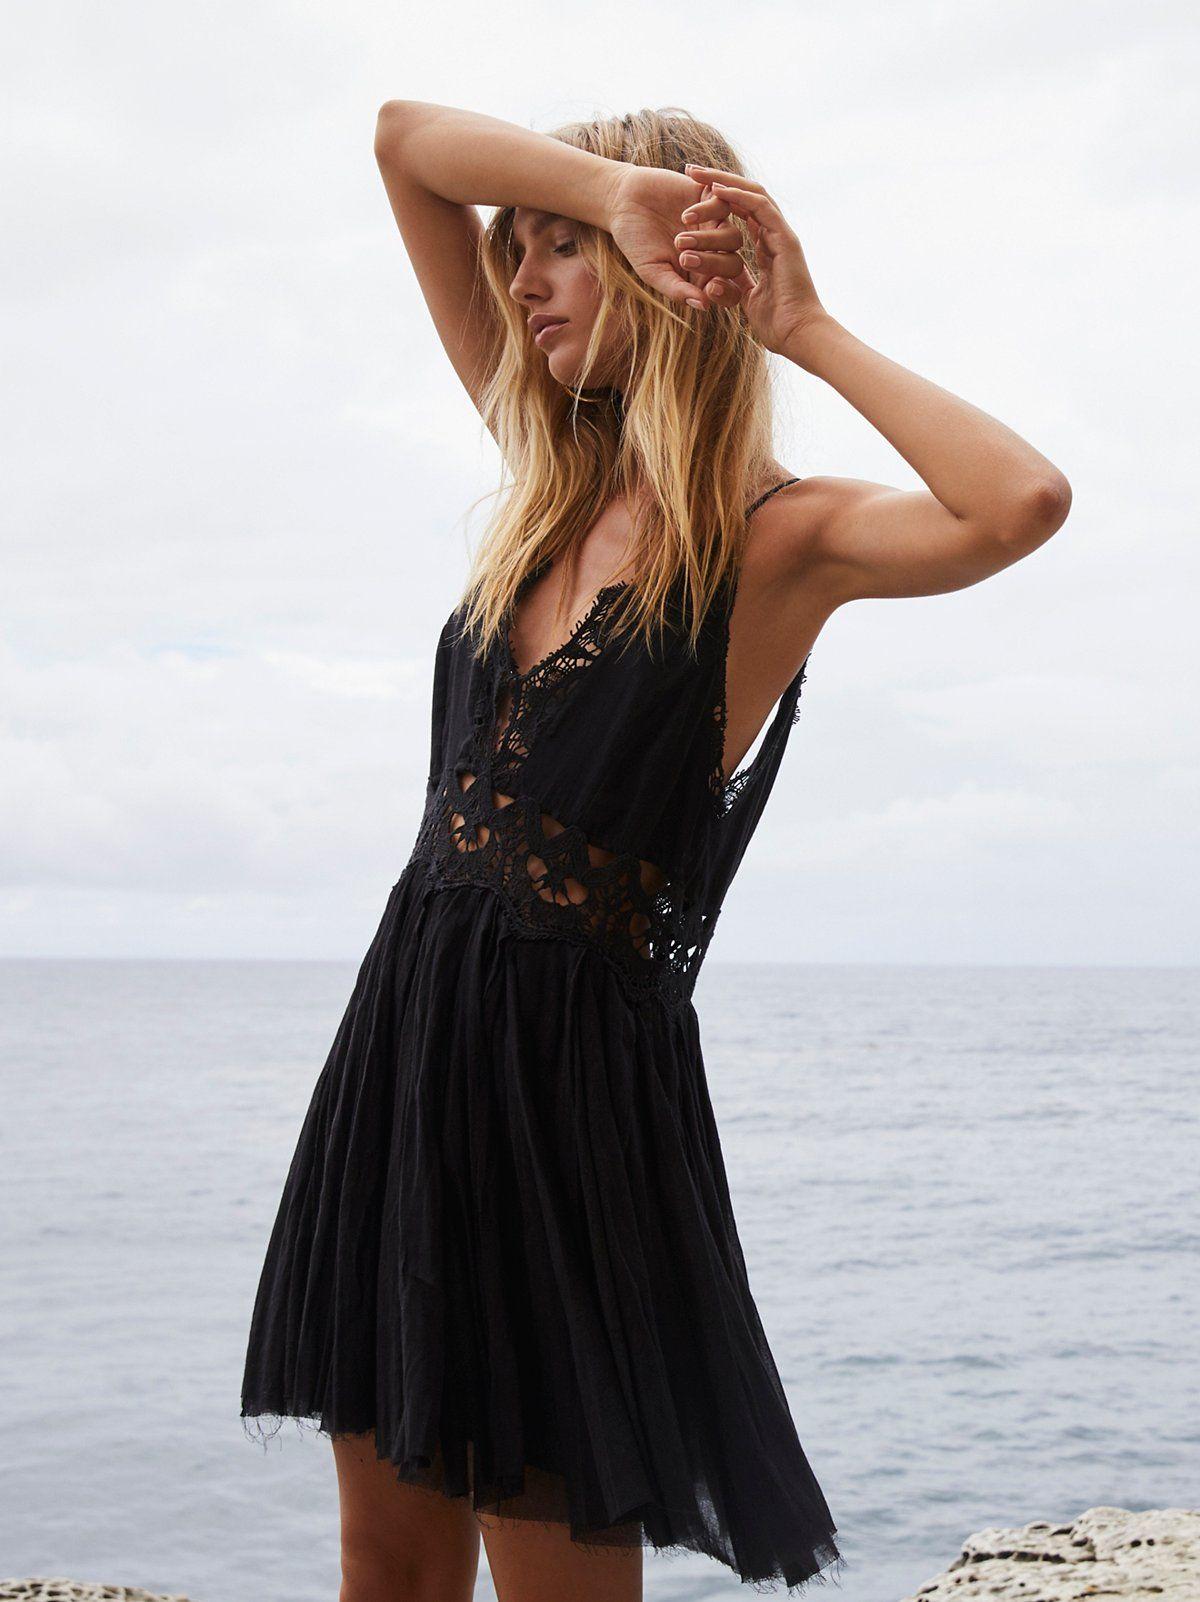 Fp one coast to cove mini dress lightweight cotton mini dress